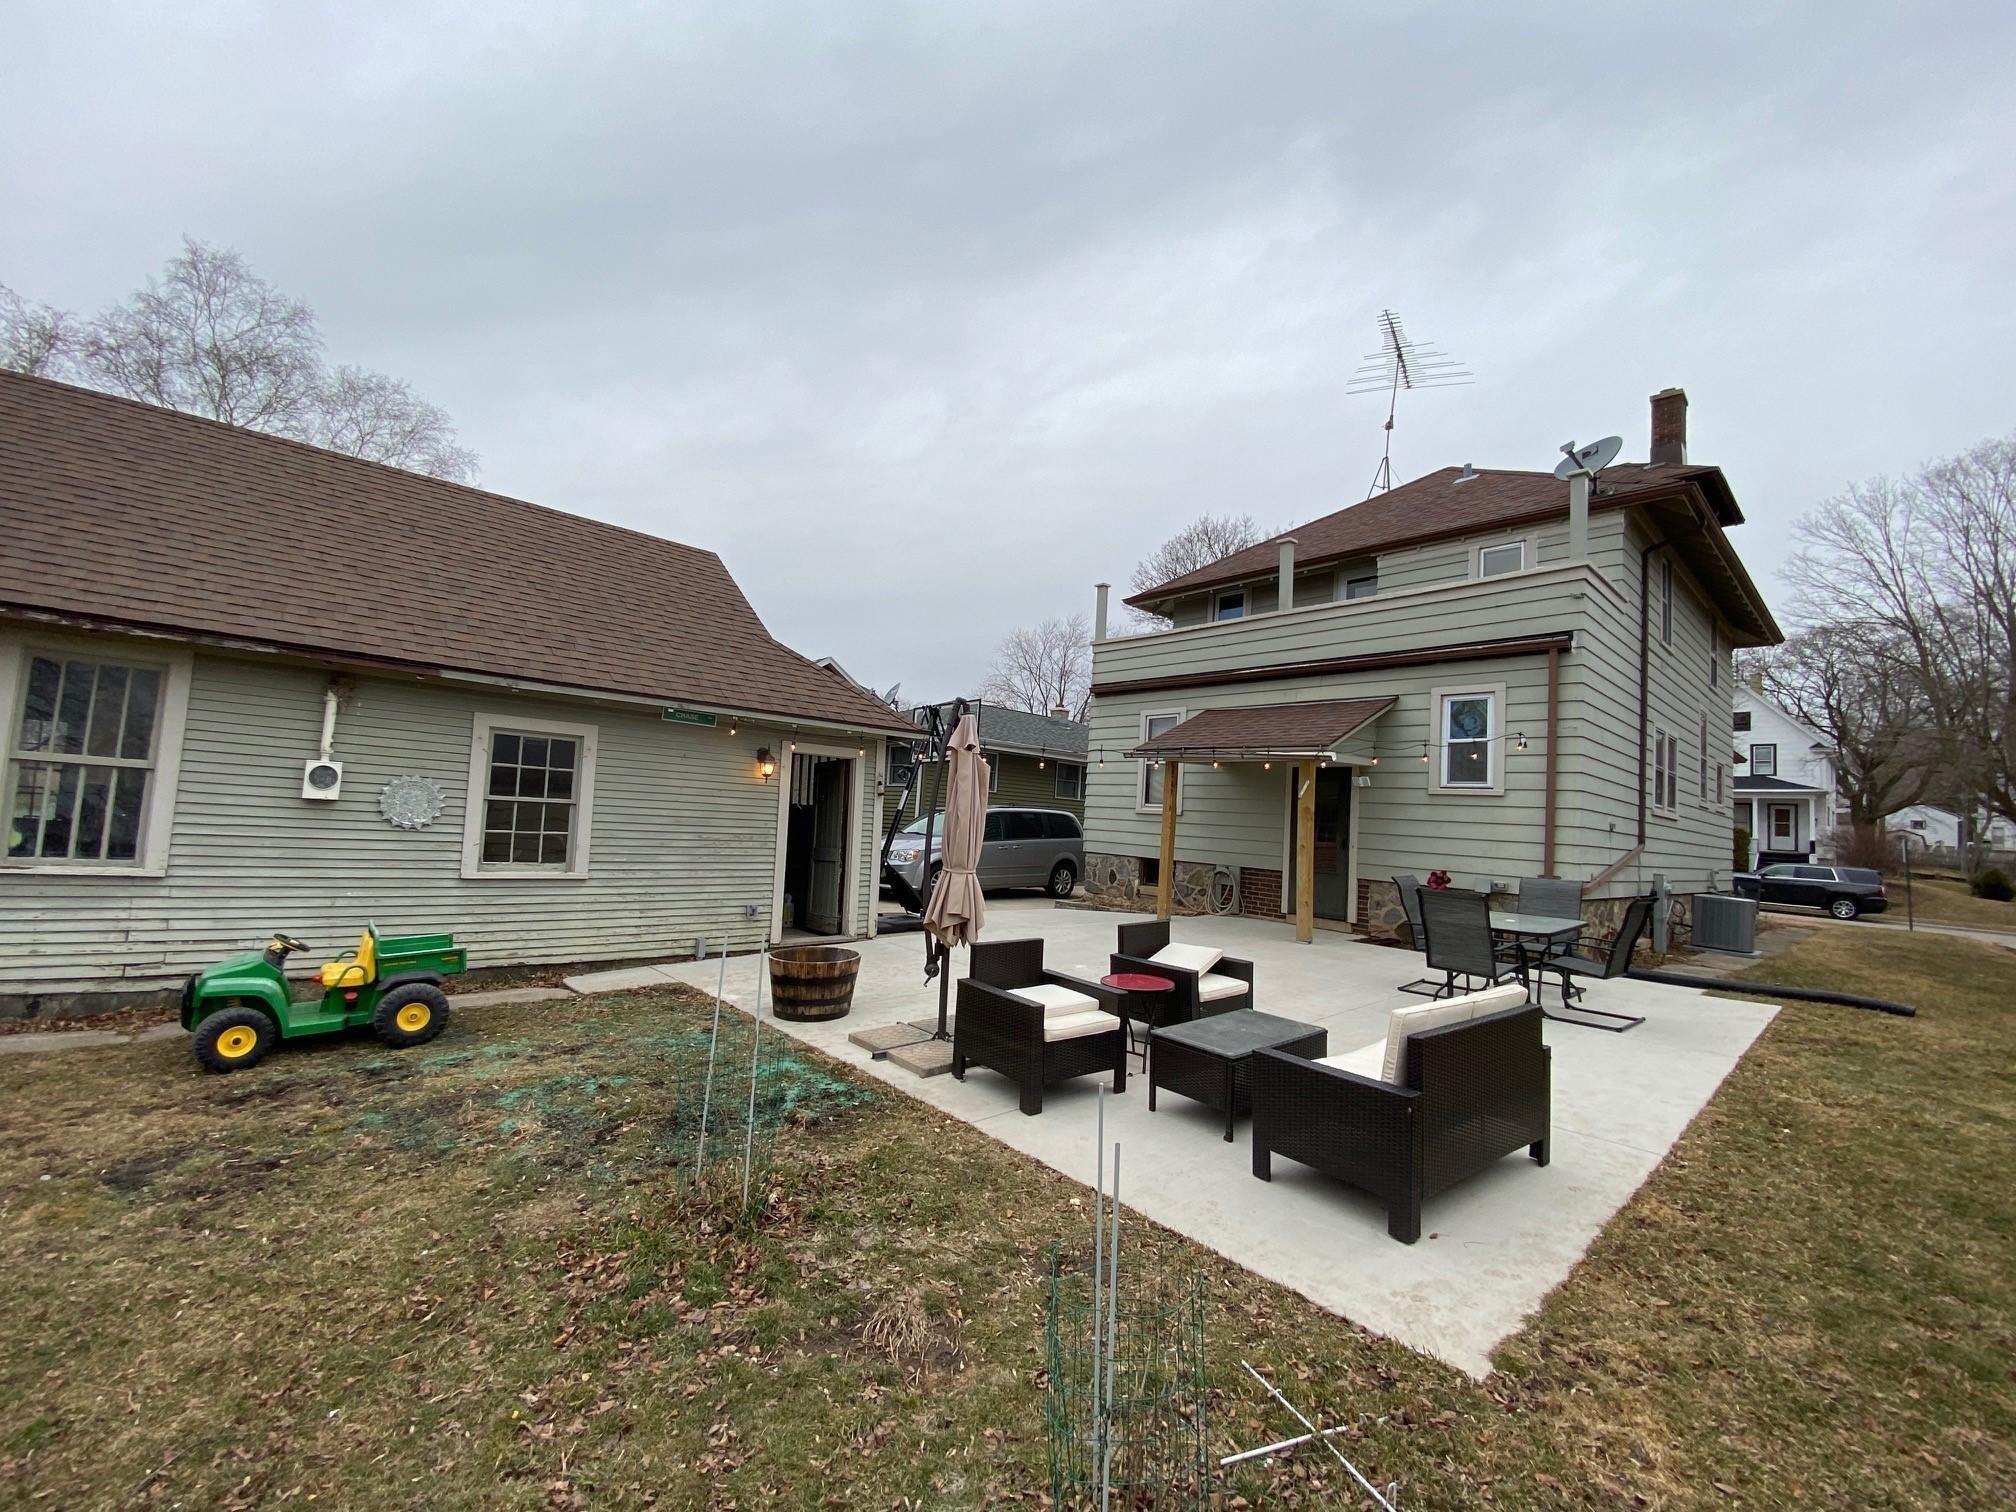 Rear of House & Garage